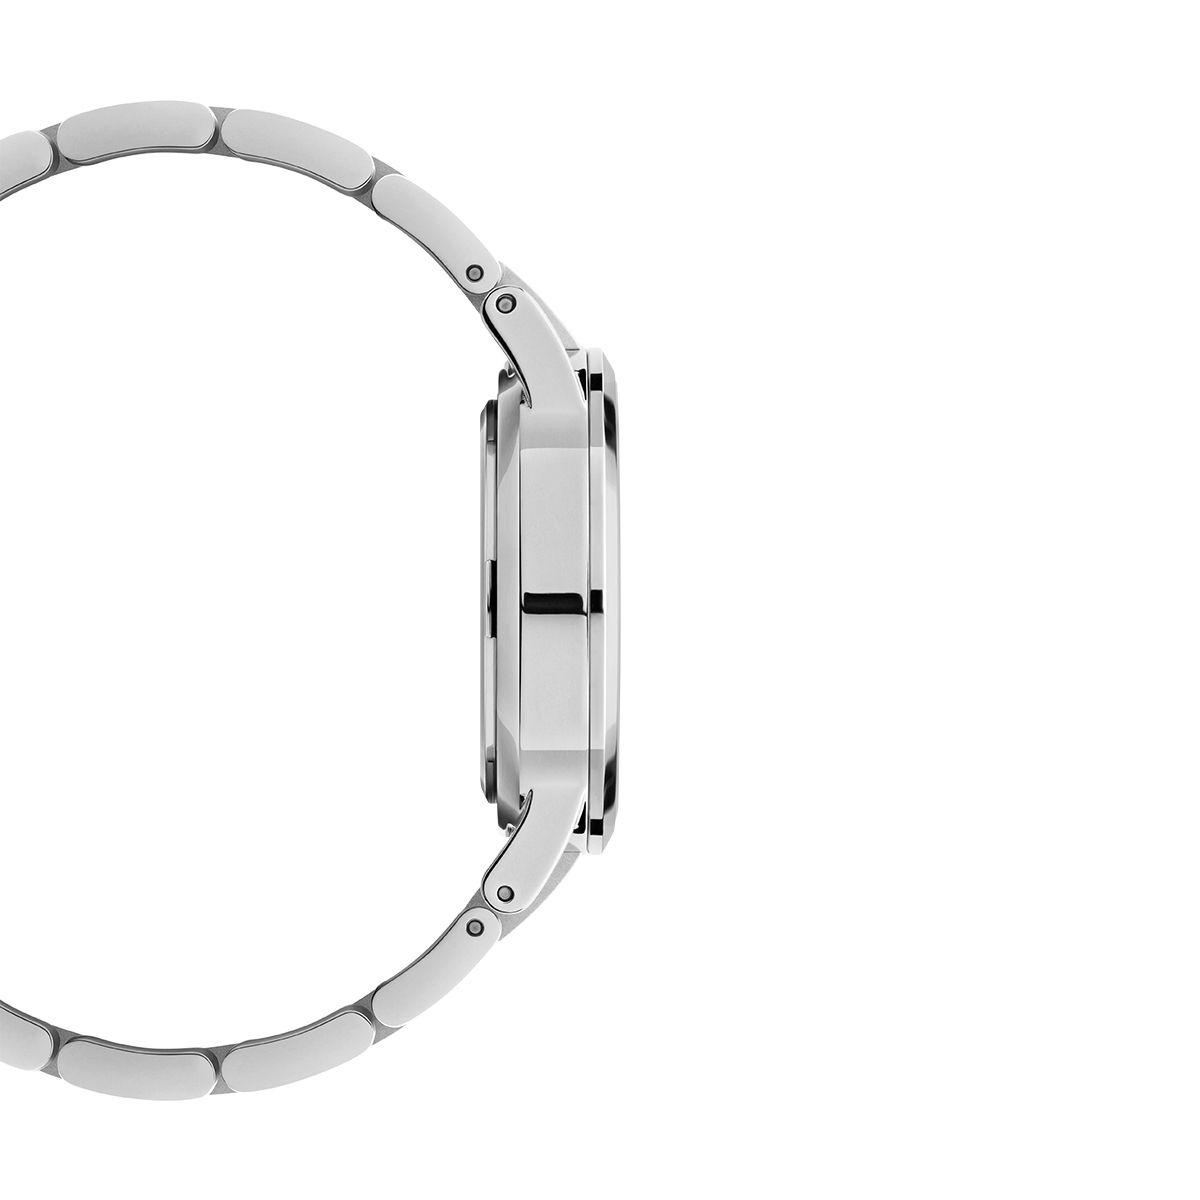 dw官网 dw手表官网 dw中国官网 dw官方旗舰店 DW DW官网  Watch Iconic Black Link Silver 32mm